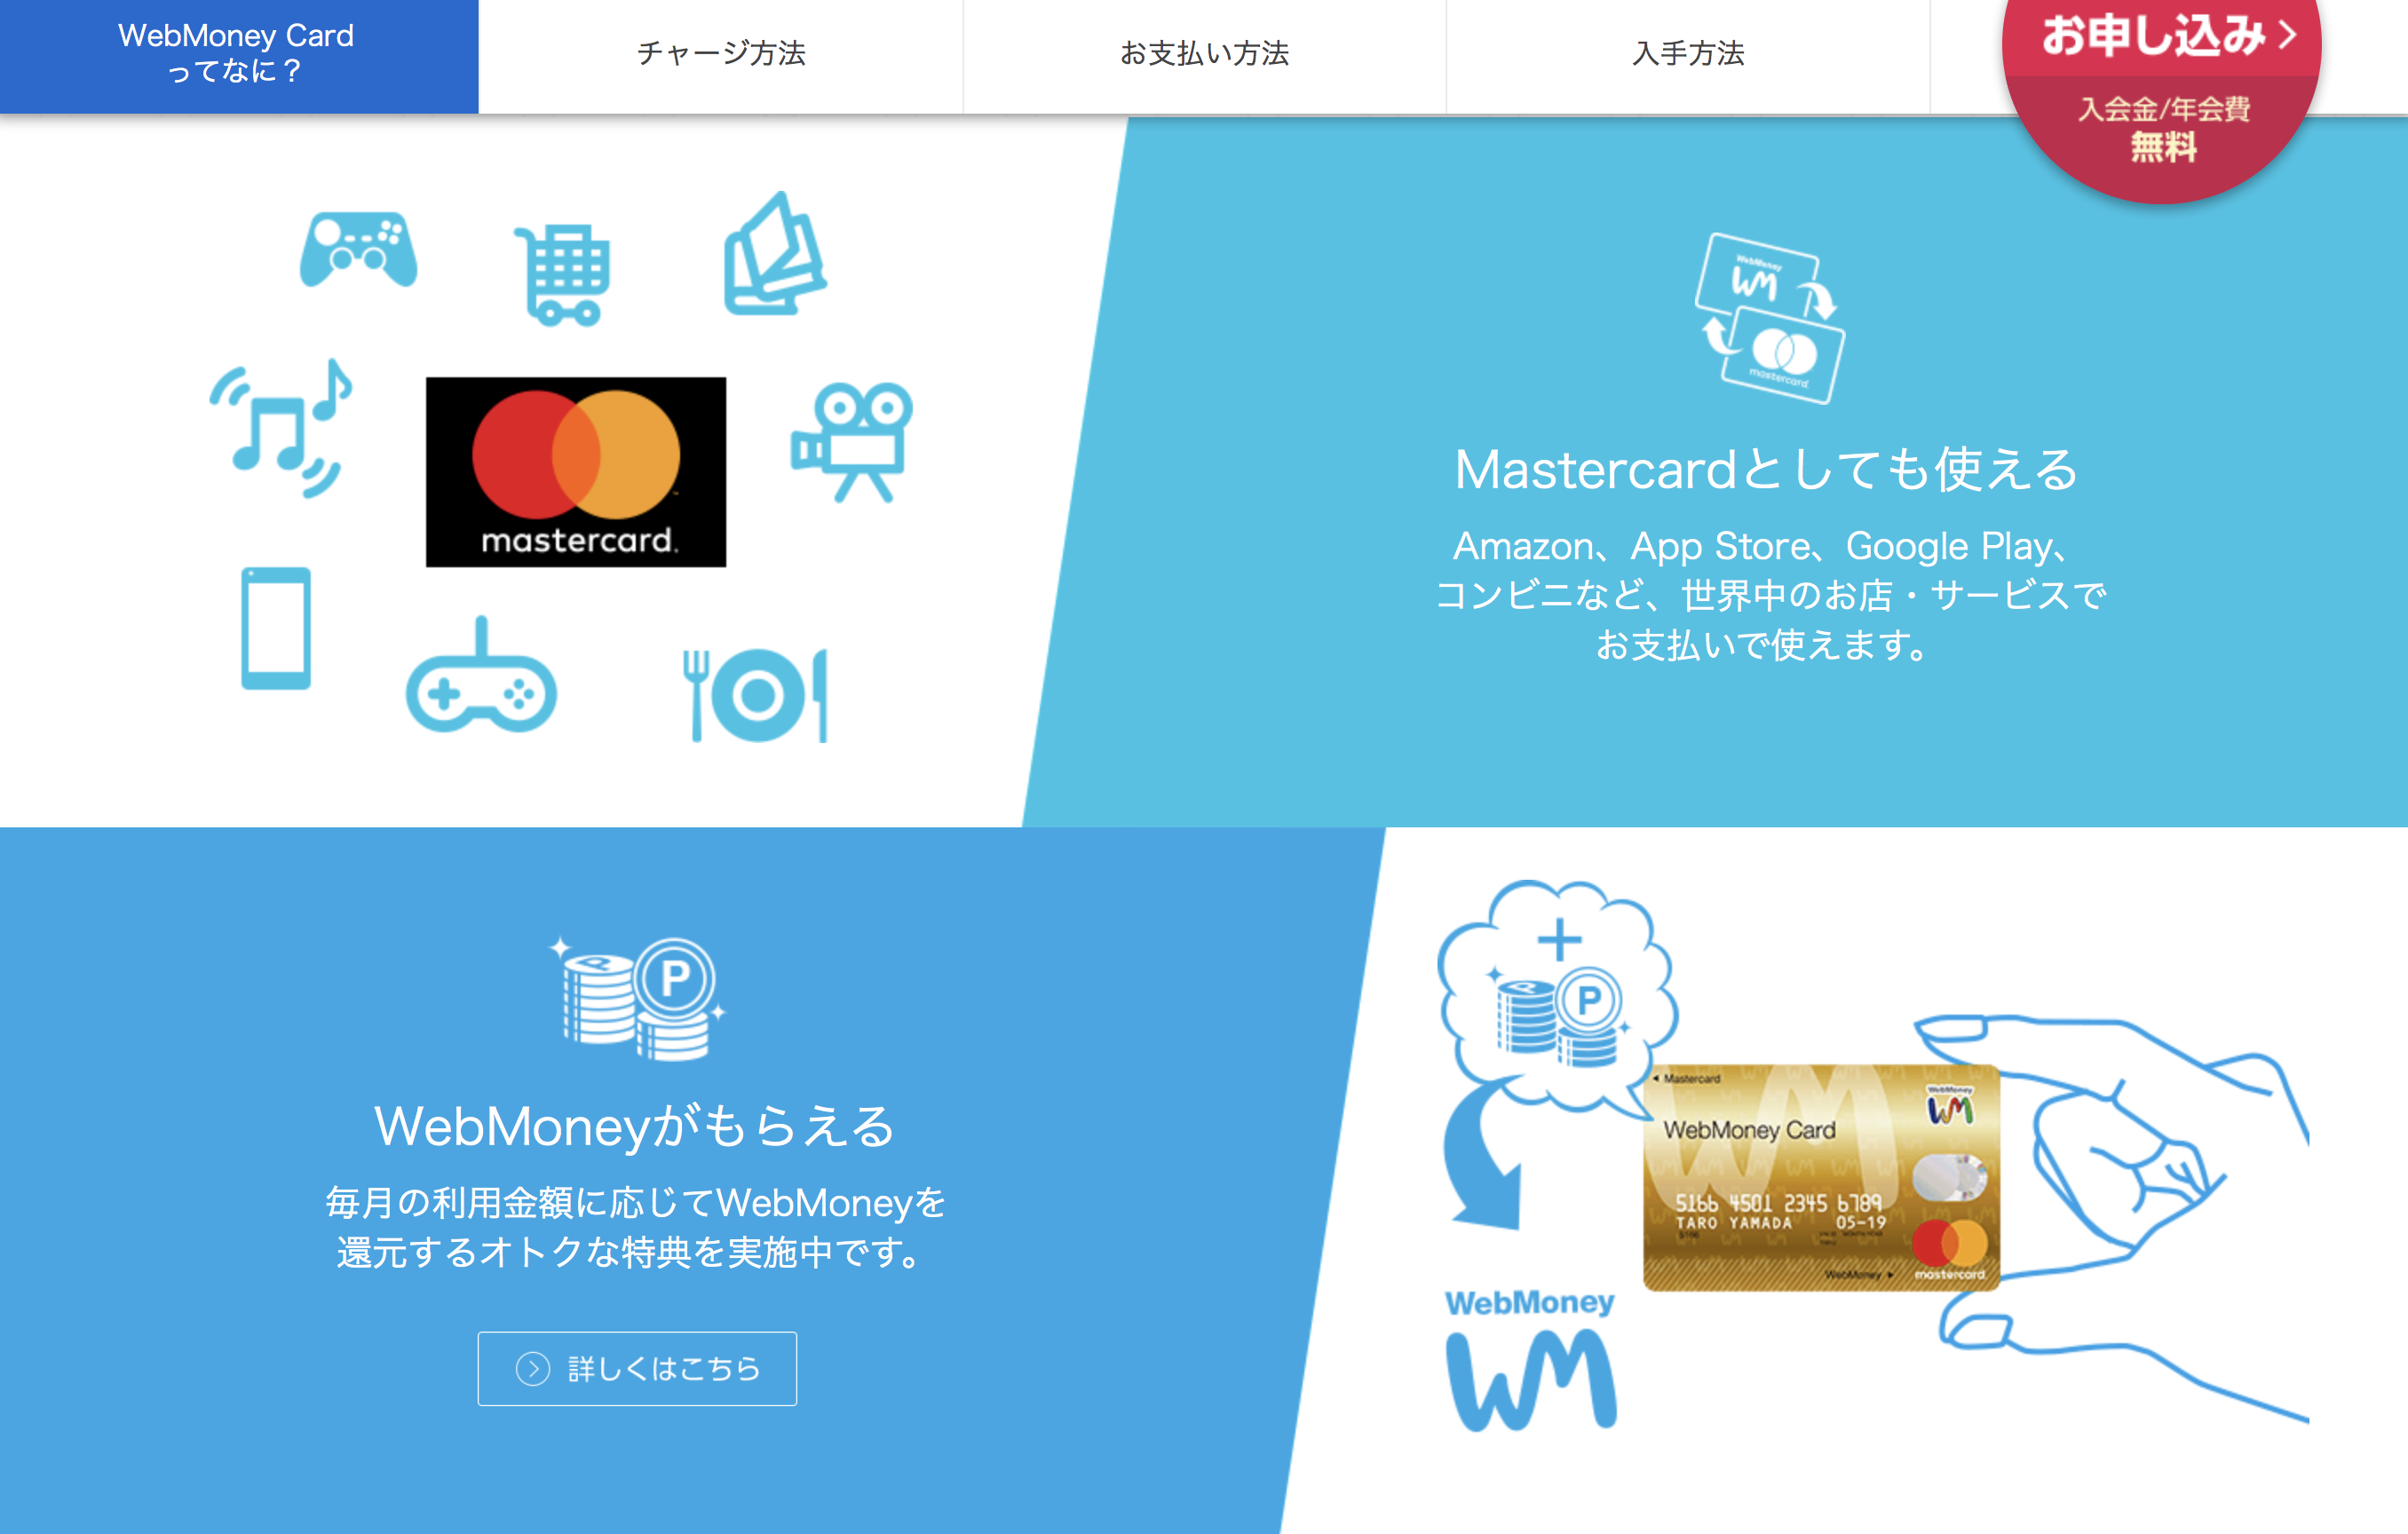 WebMoney Card(ウェブマネーカード)